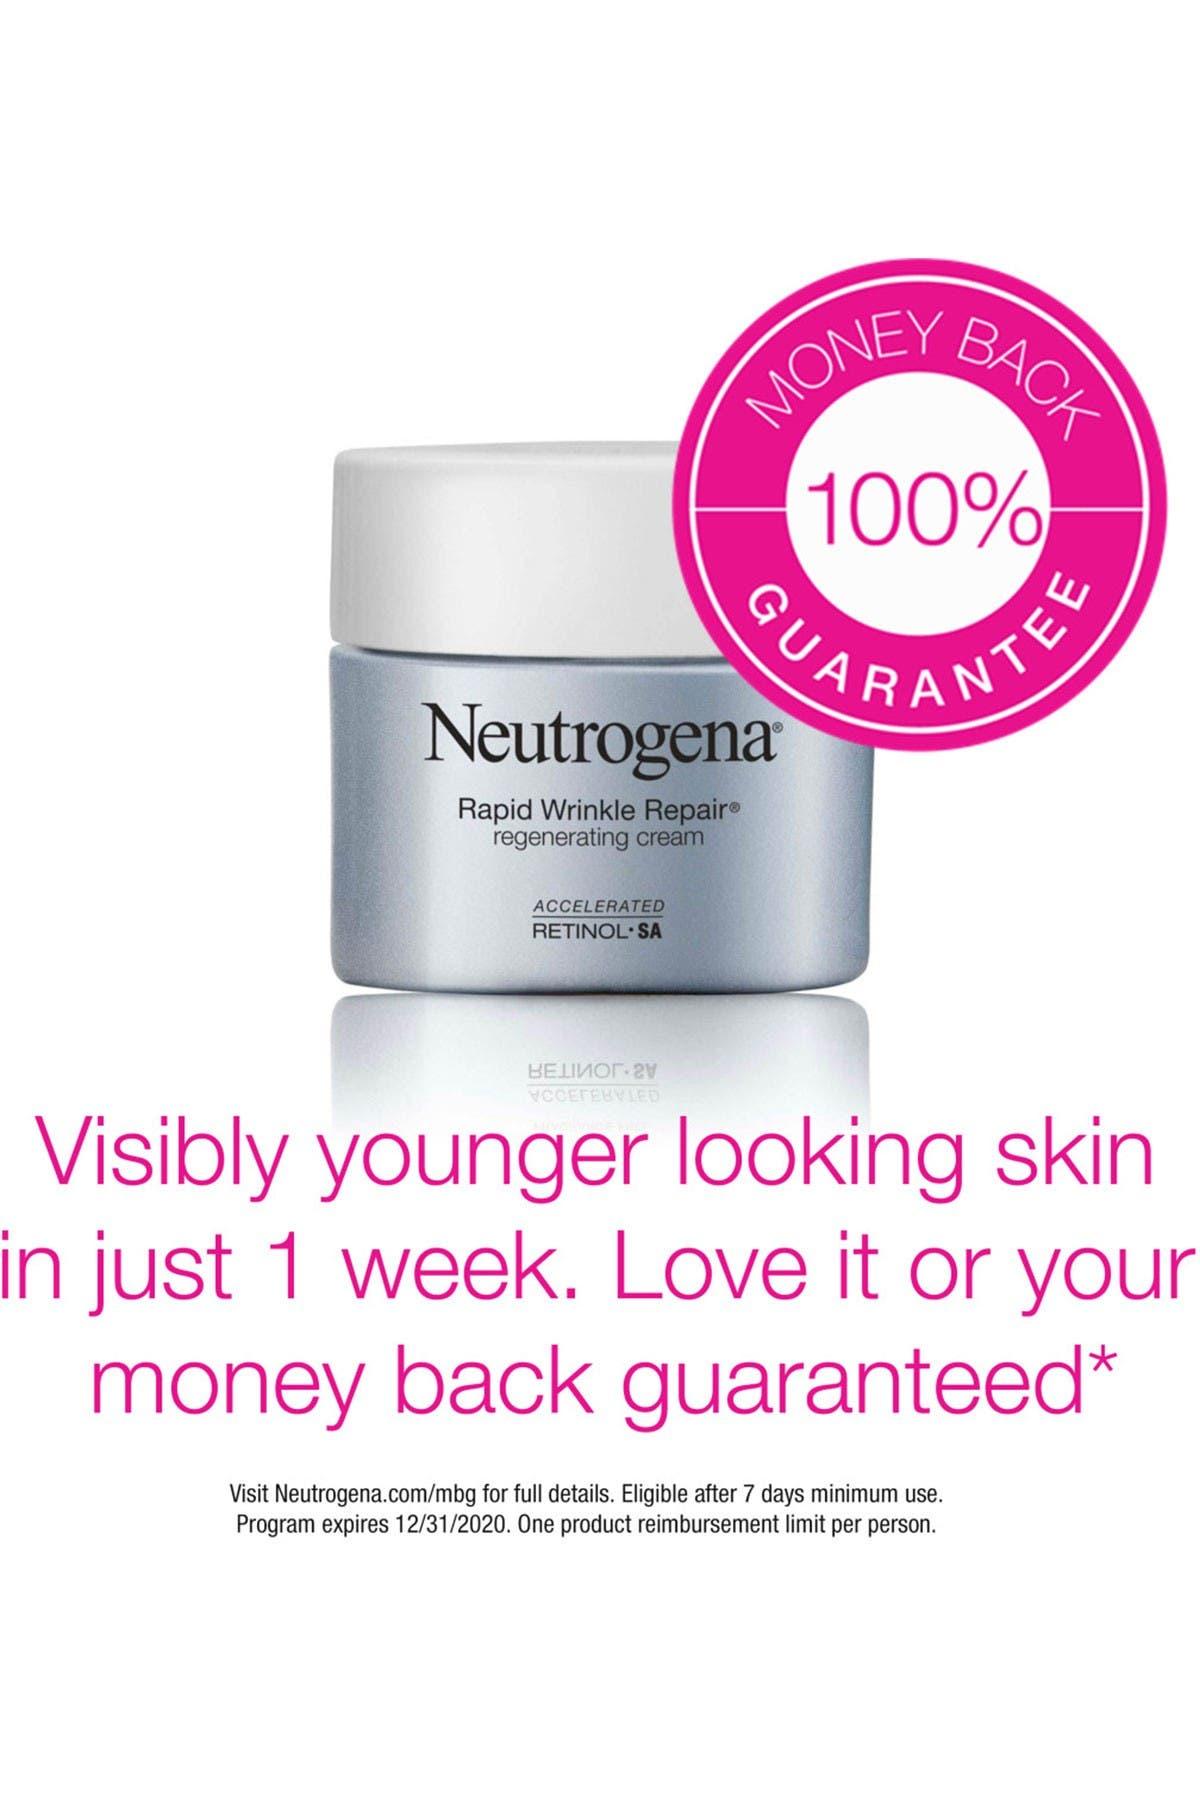 Image of Neutrogena Rapid Wrinkle Repair Retinol Regenerating Face Cream & Hyaluronic Acid Anti-Wrinkle Face Moisturizer, Neck Cream, with Hyaluronic Acid & Retinol, Travel Size, 0.5 oz